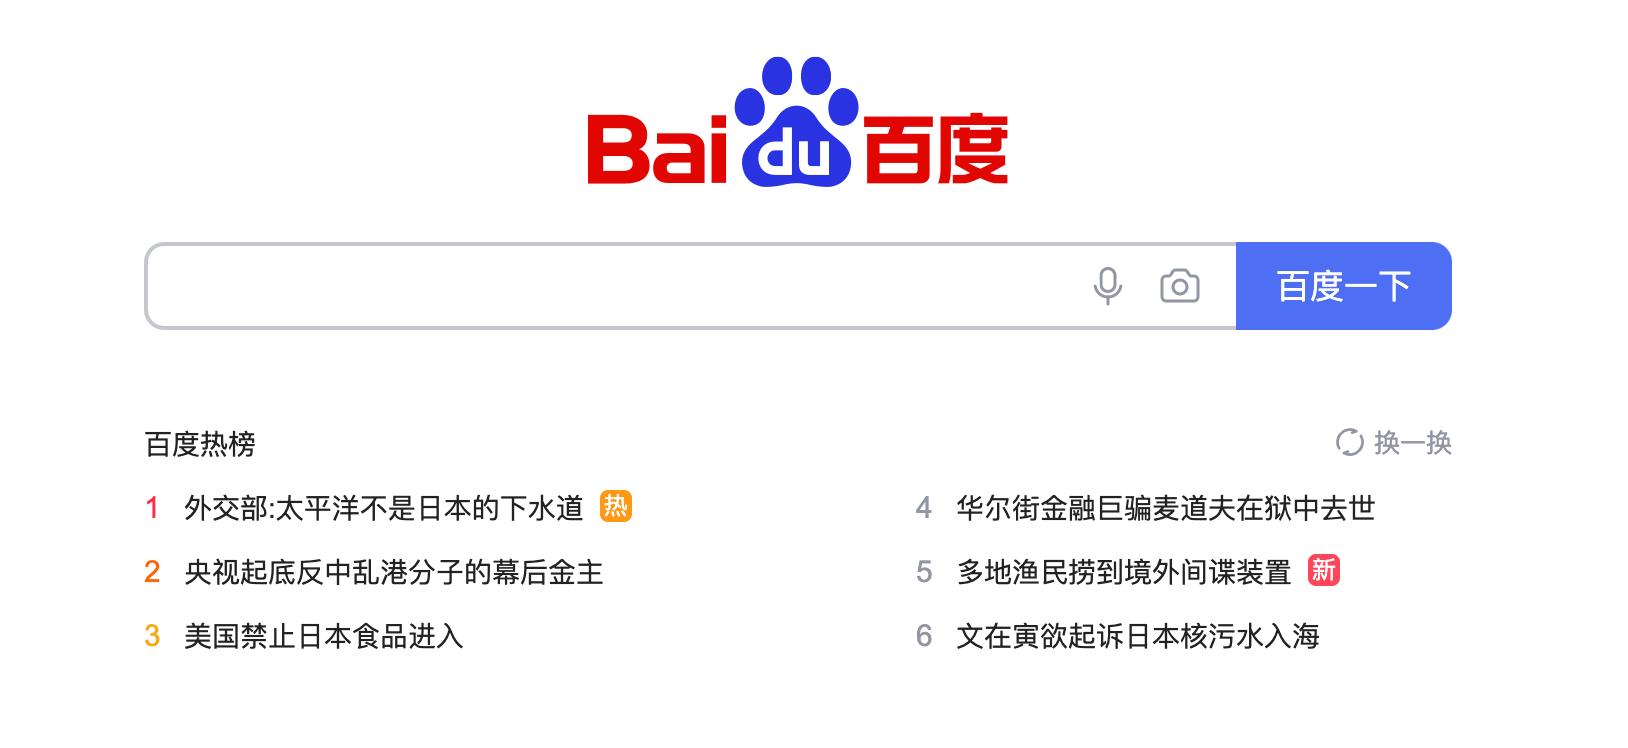 baidu - motori di ricerca